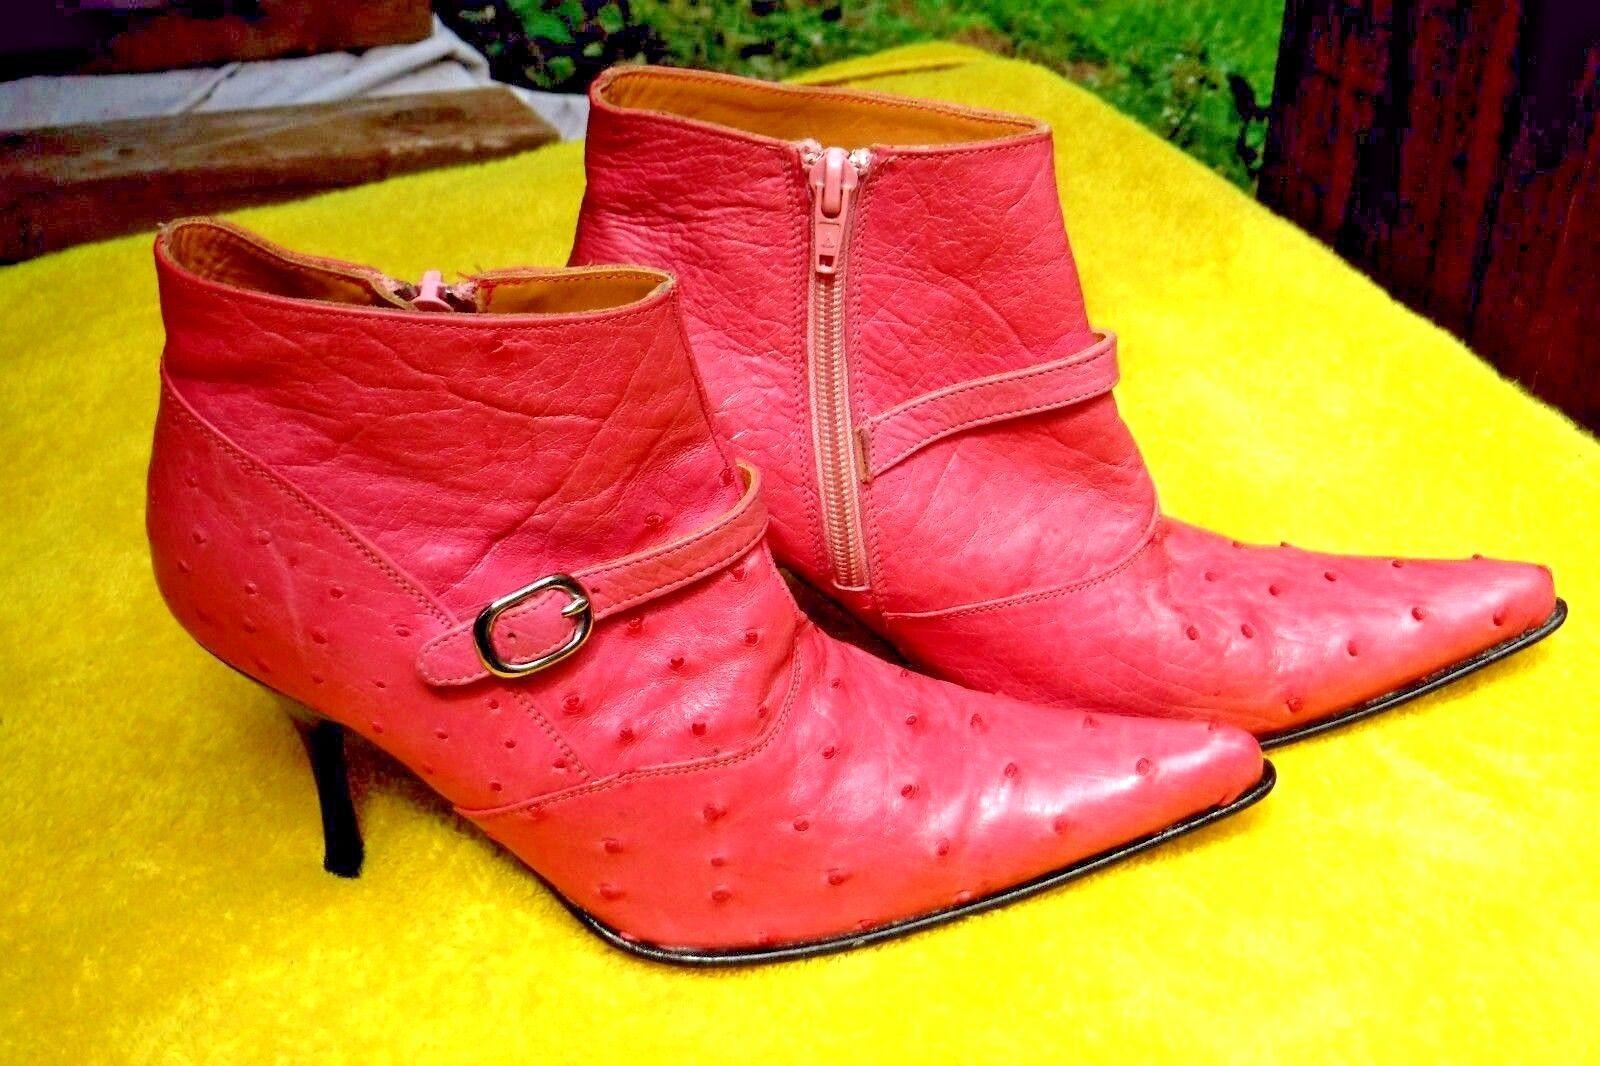 sconto online di vendita PRE-OWNED(CUSTOM MADE)nero JACK FULL FULL FULL QUILL OSTRICH ANKLE stivali, SZ.6.5B donna  acquista online